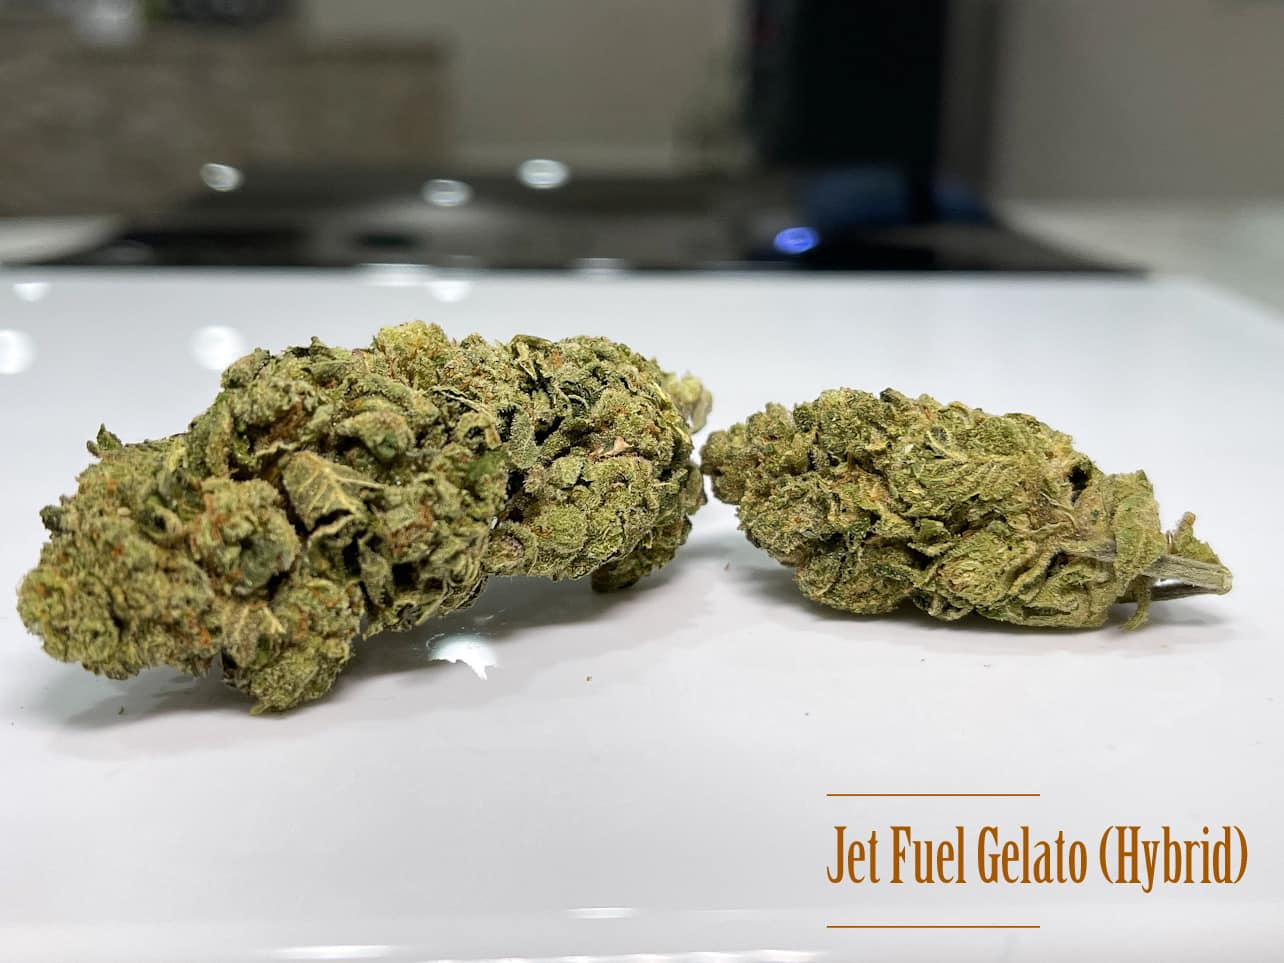 Jet Fuel Gelato strain